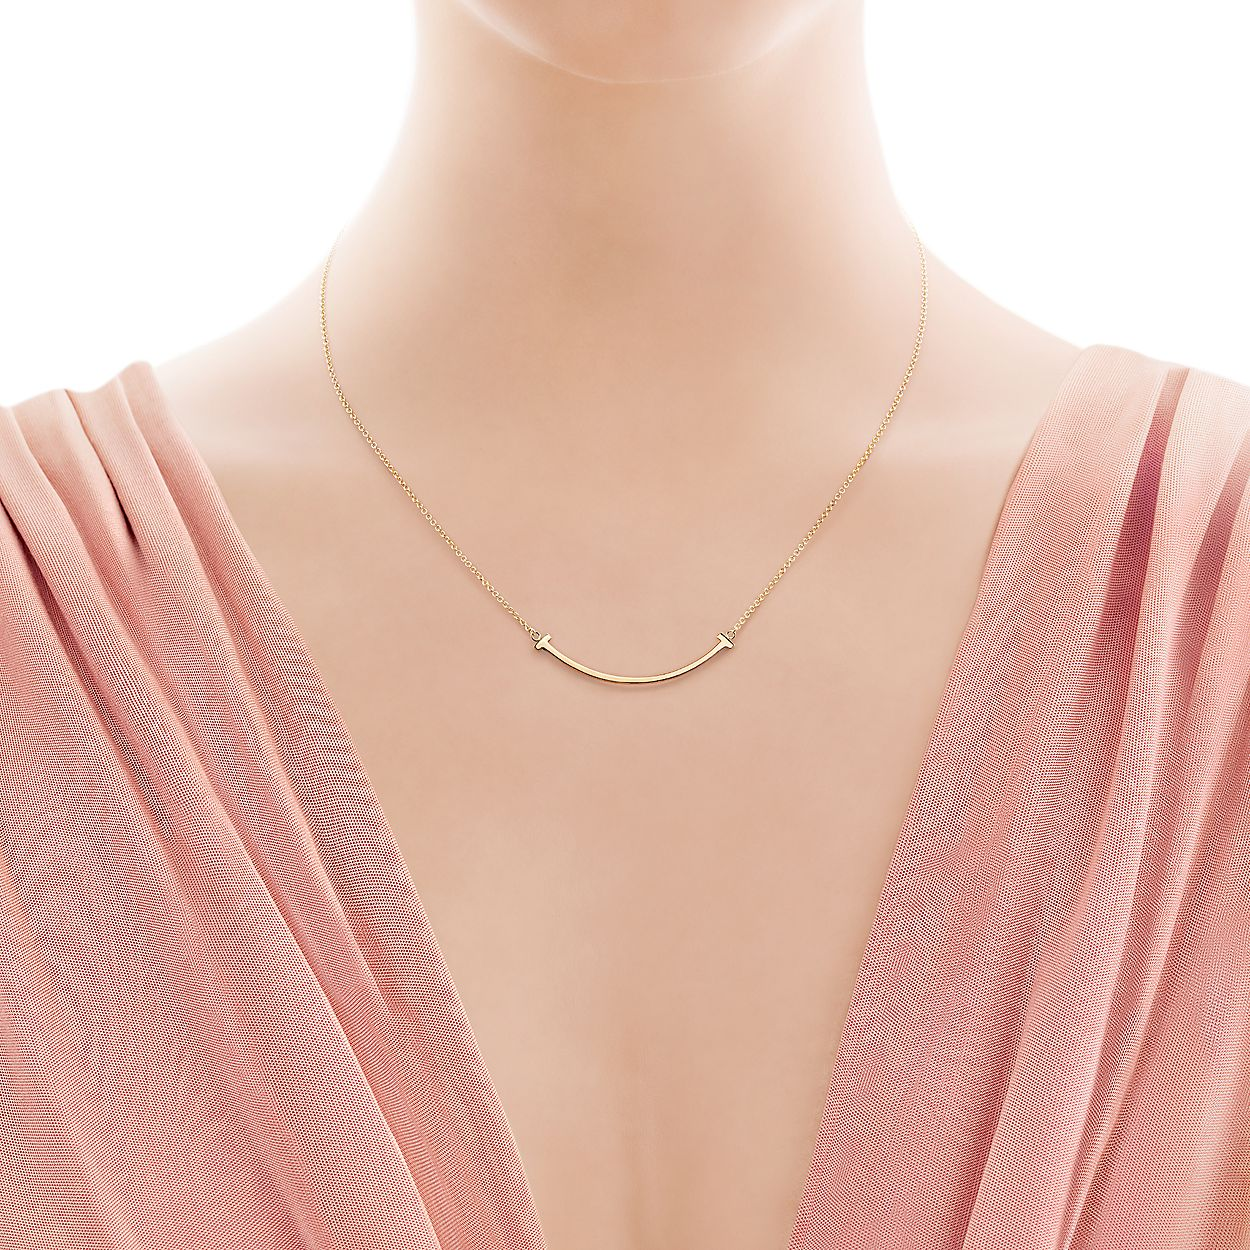 81c5e4113 Tiffany T smile pendant in 18k gold, mini.   Tiffany & Co.